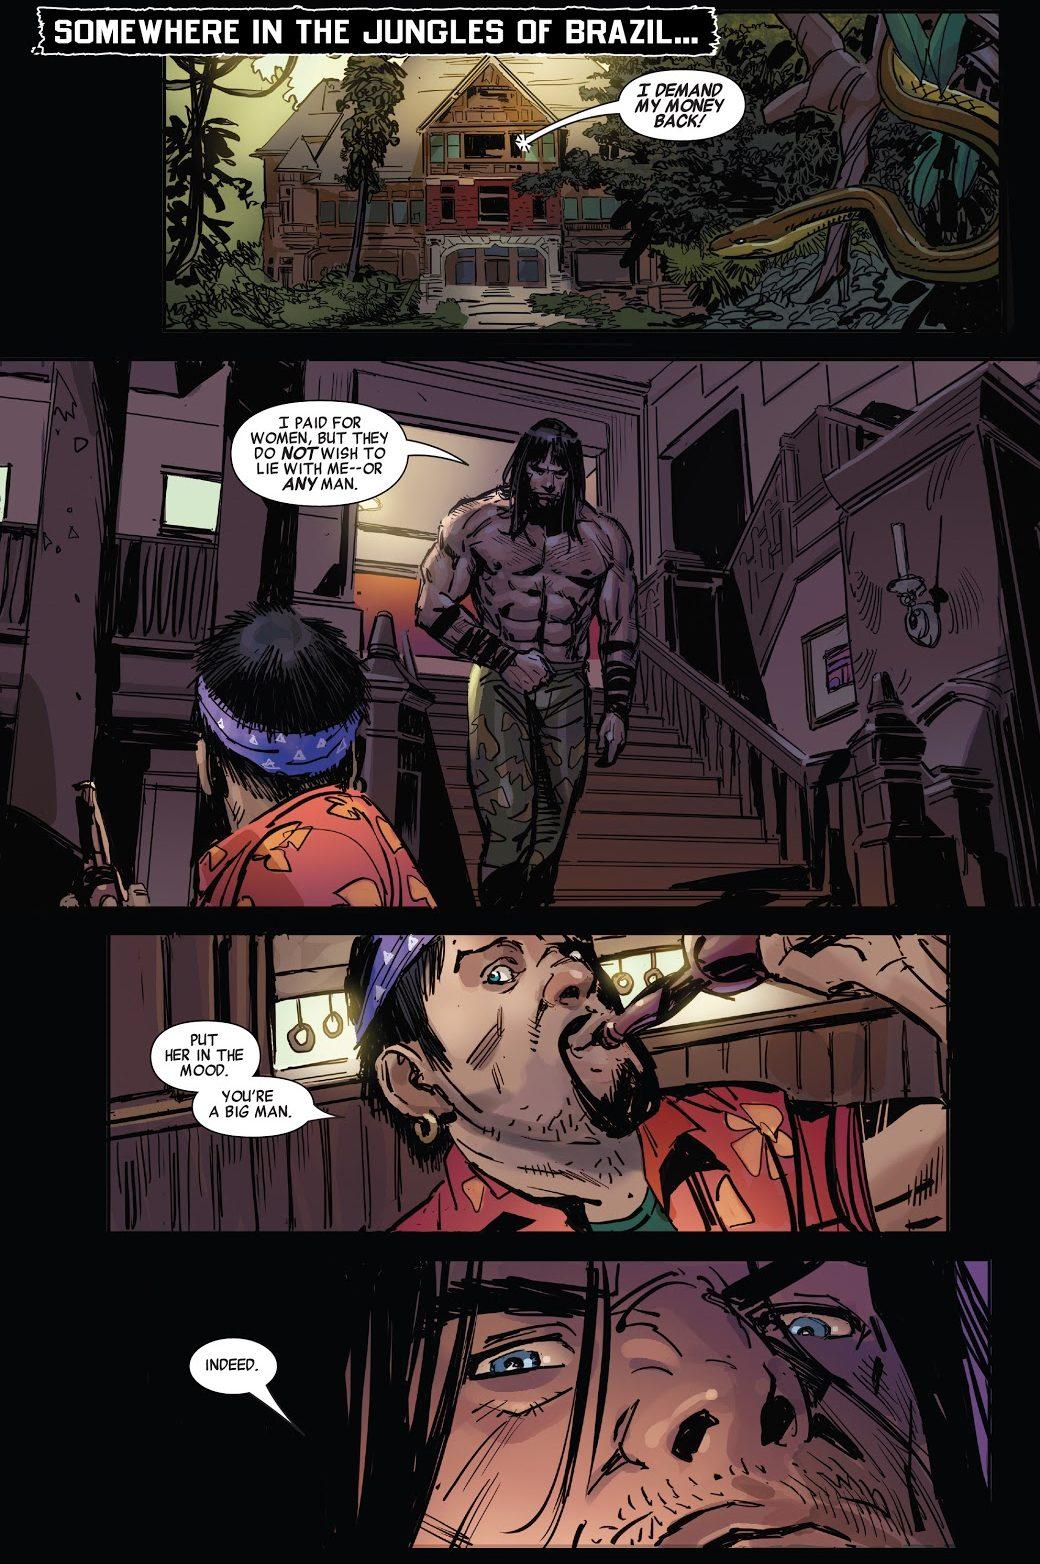 Conan The Barbarian Inside A Brothel